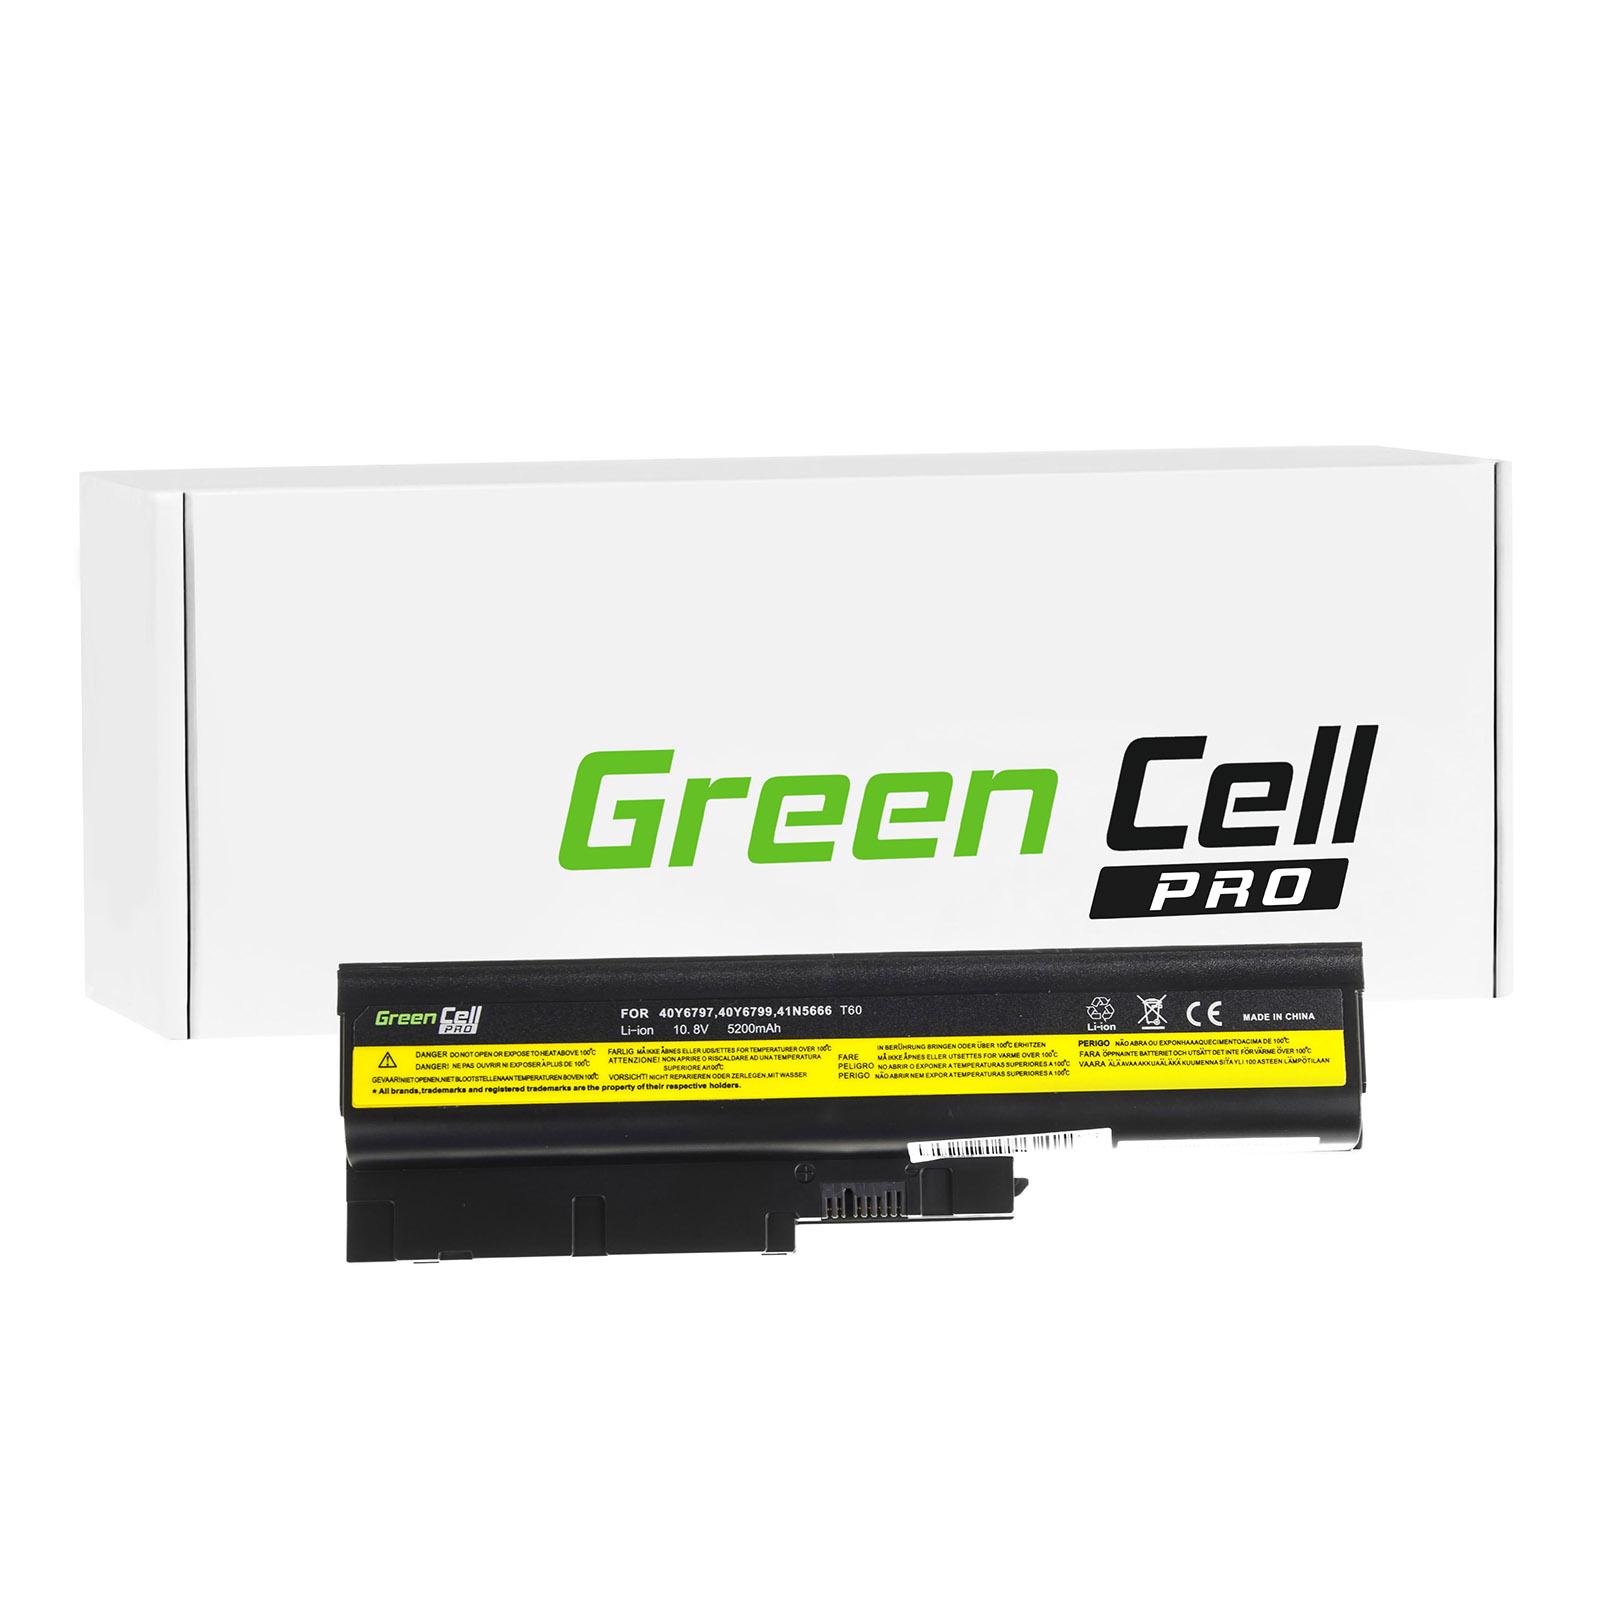 green cell pro batterie lenovo ibm thinkpad t500 2056. Black Bedroom Furniture Sets. Home Design Ideas